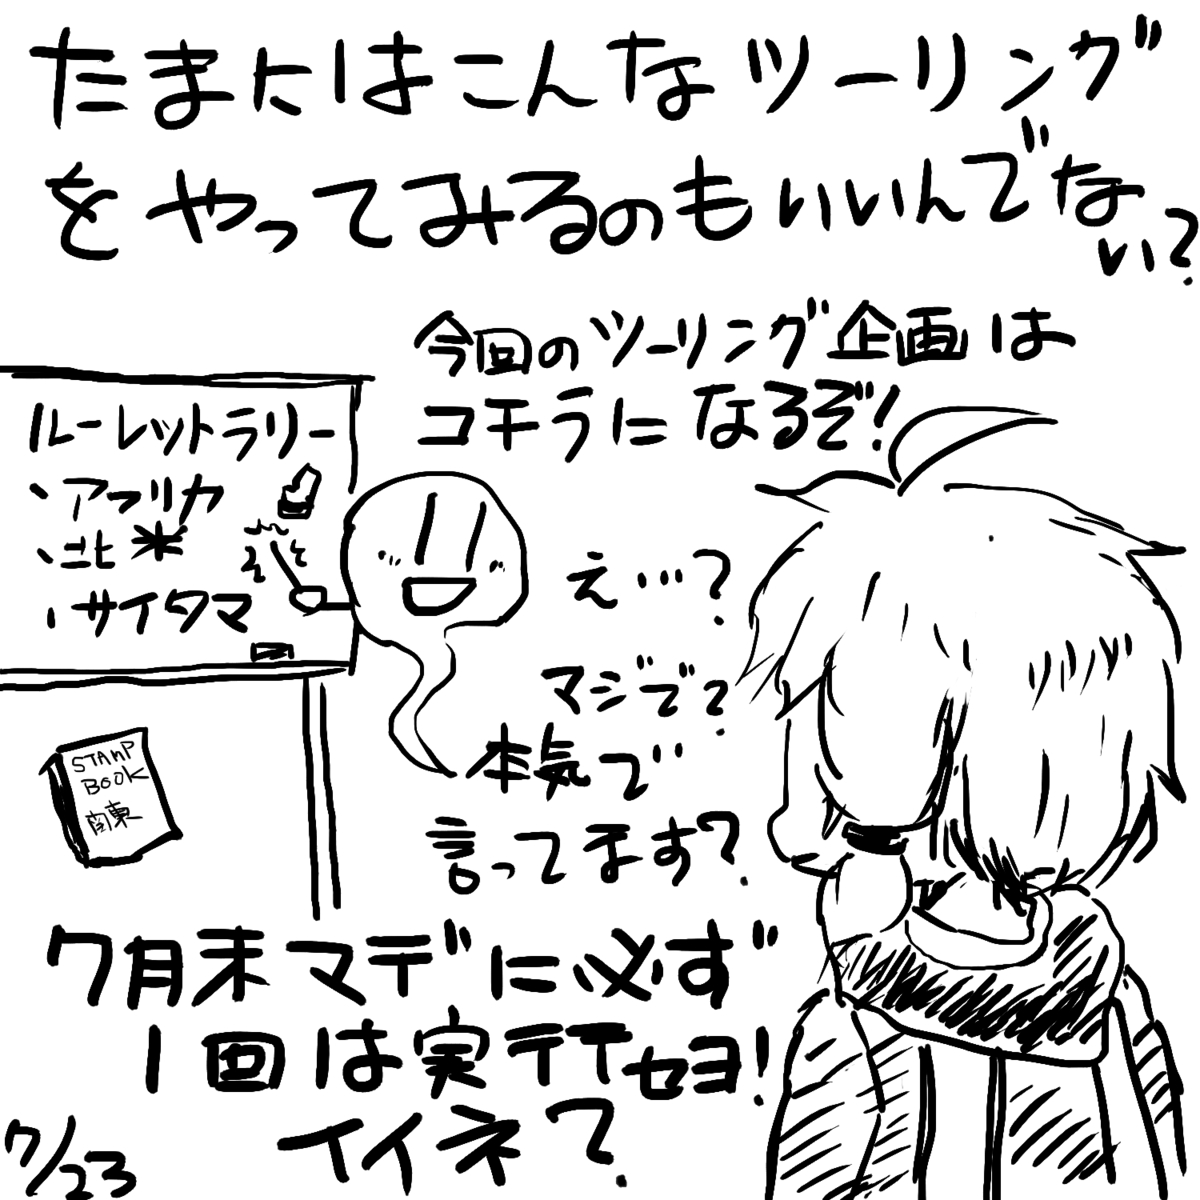 f:id:zomuzomu:20210723105808p:plain